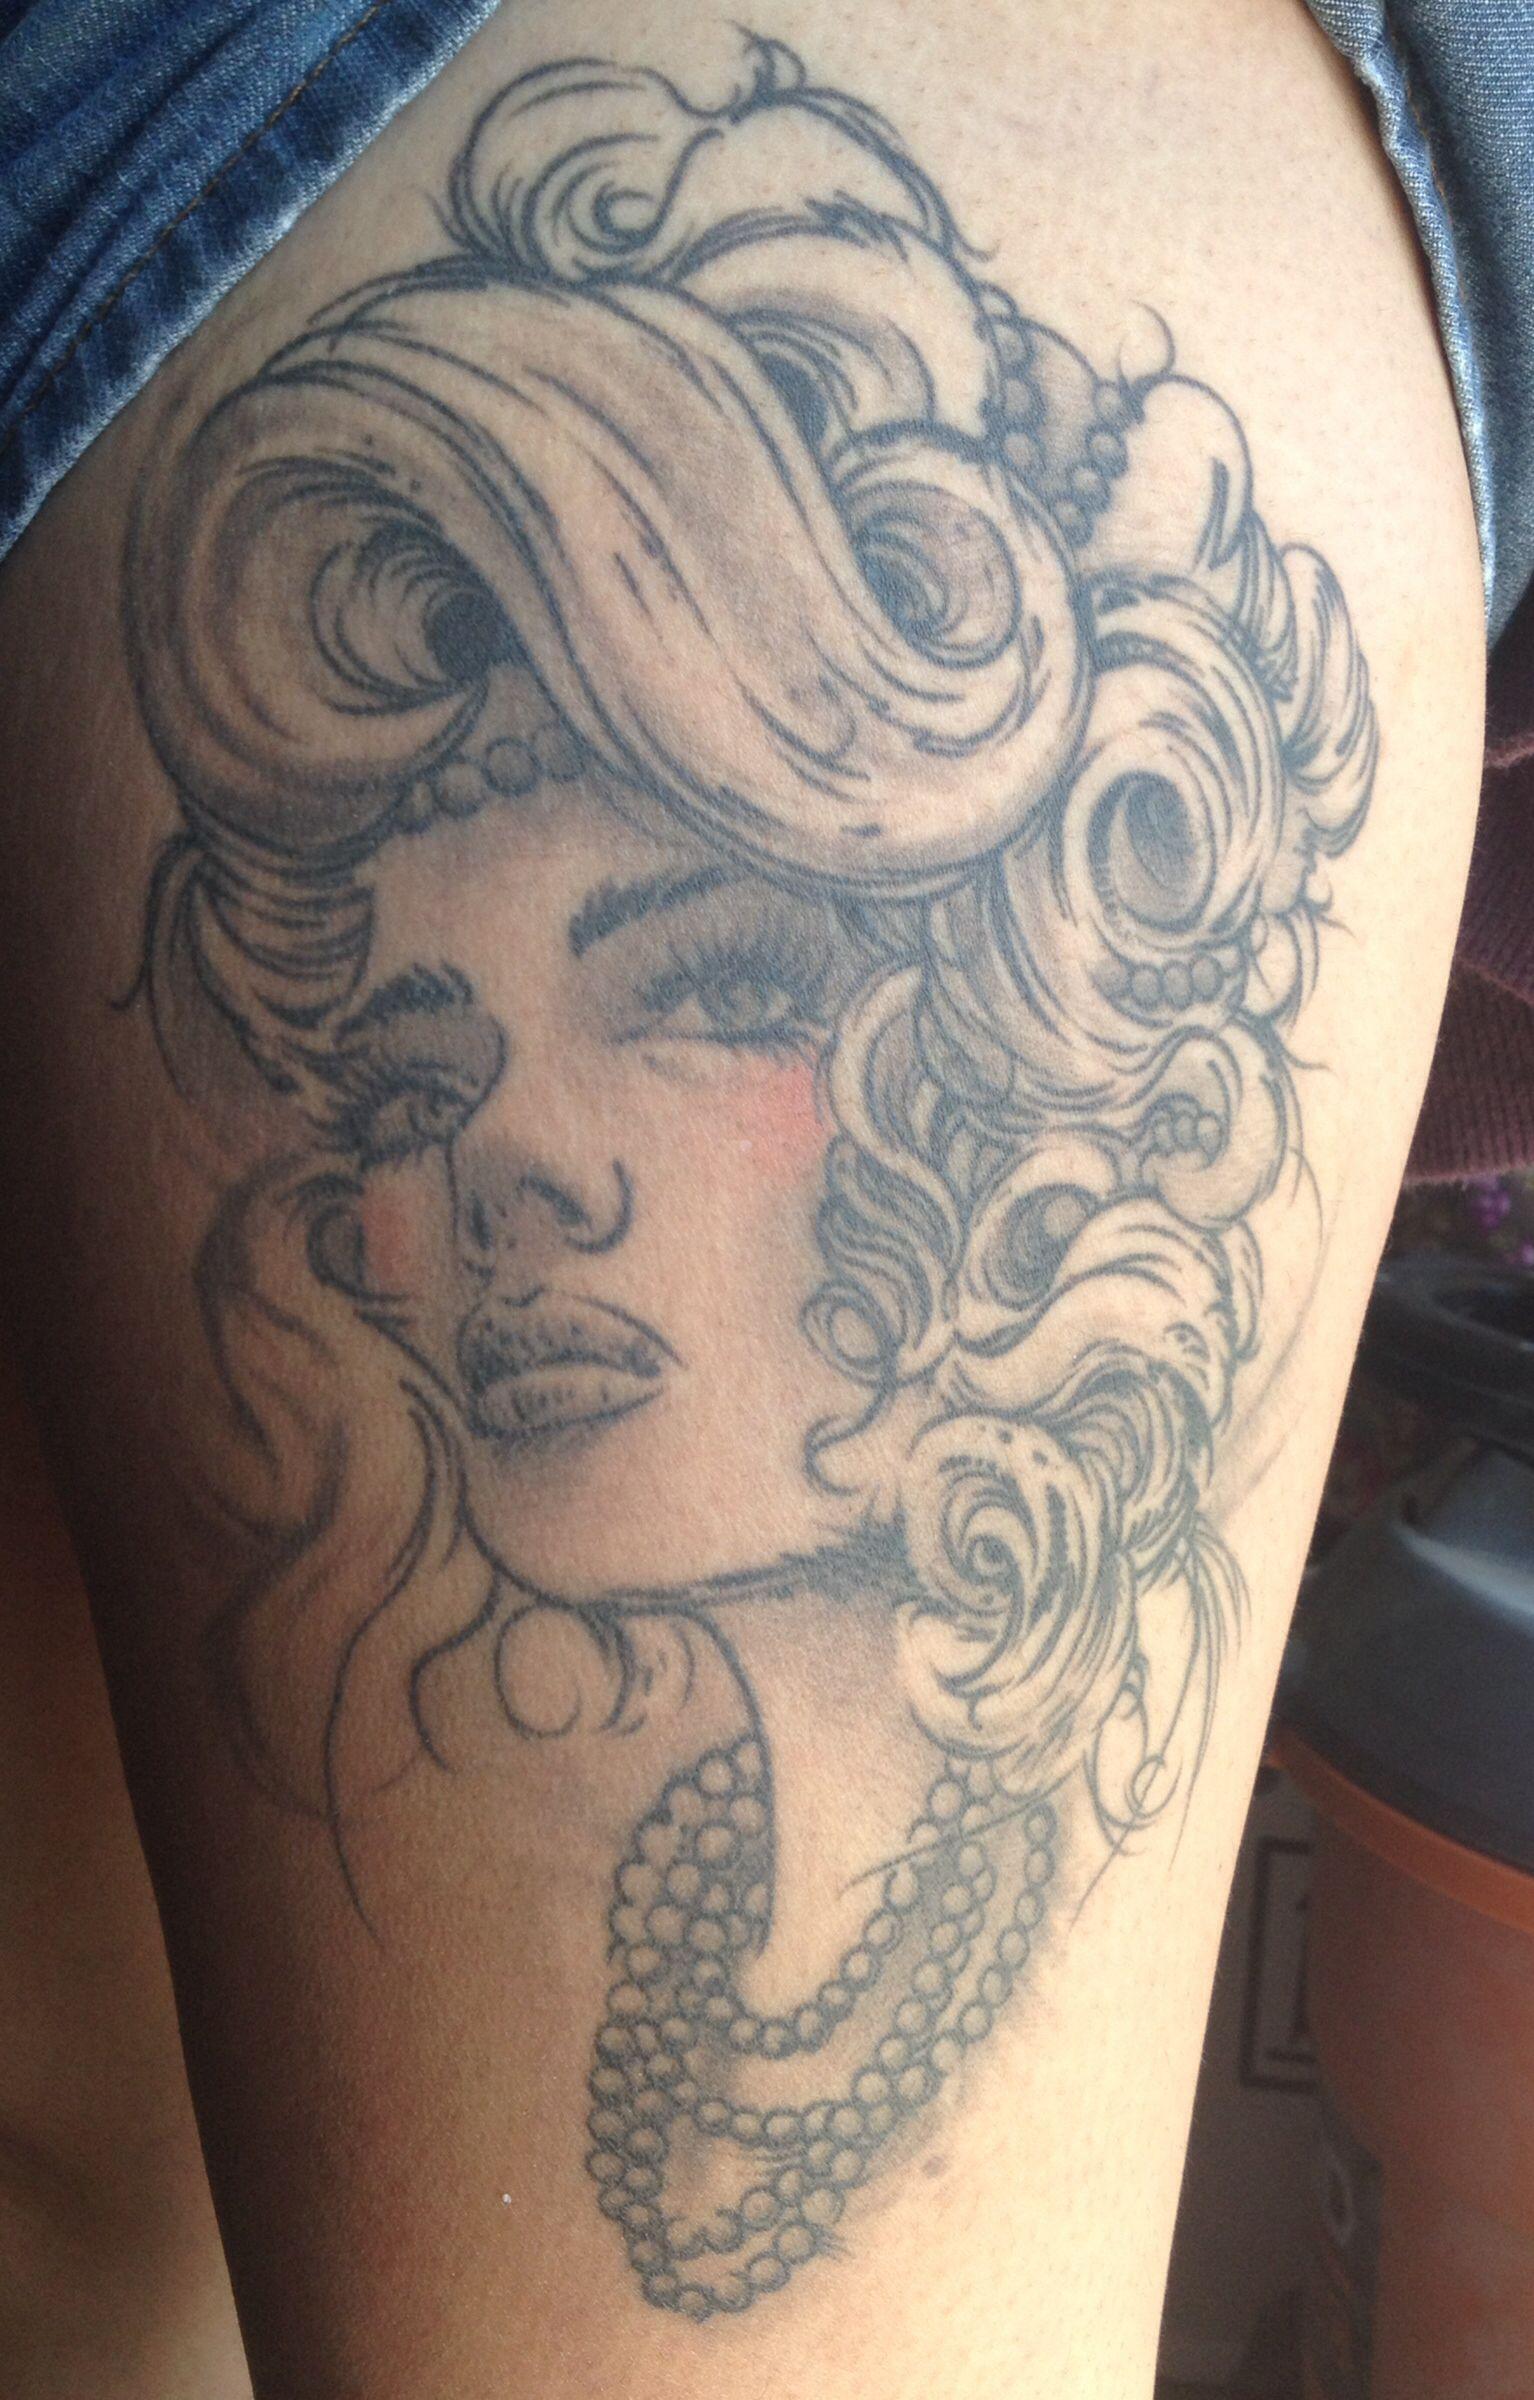 ef7a28eaea06d Mitch horn Art labs tattoo studio Federal way, WA | Tattoos | Body ...